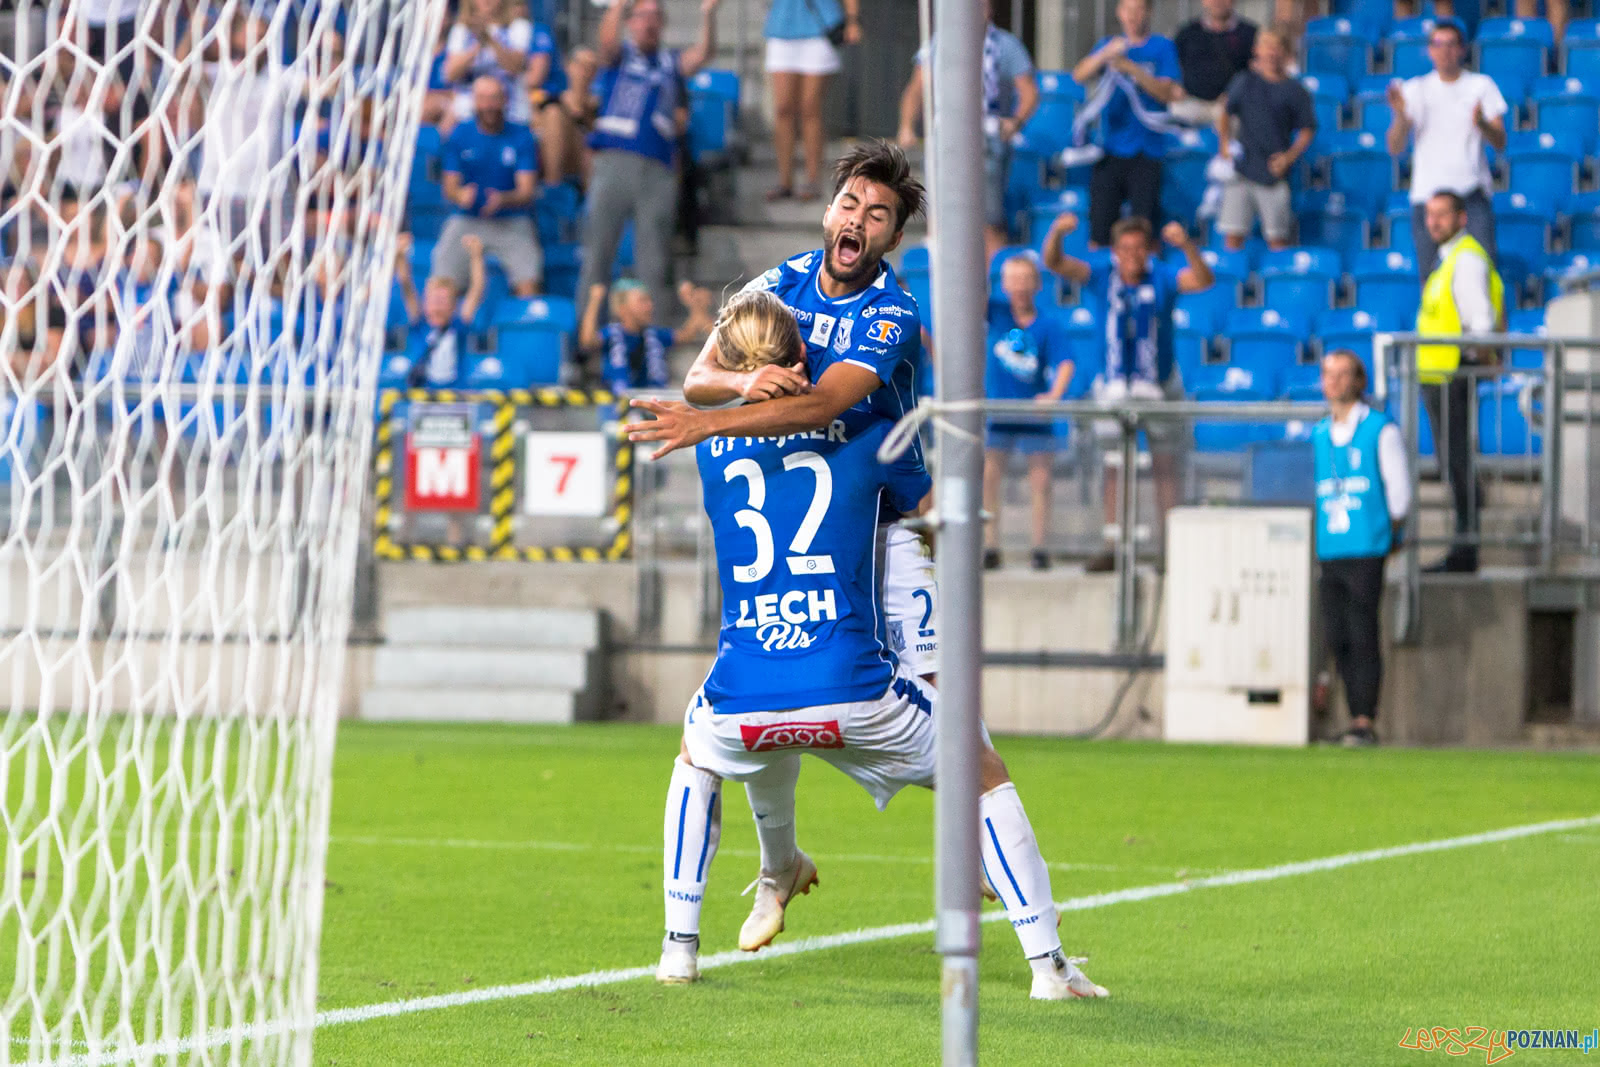 Lech Poznań - FC Shakhtyor Soligorsk (Christian Gytkjaer, Joao  Foto: lepszyPOZNAN.pl/Piotr Rychter